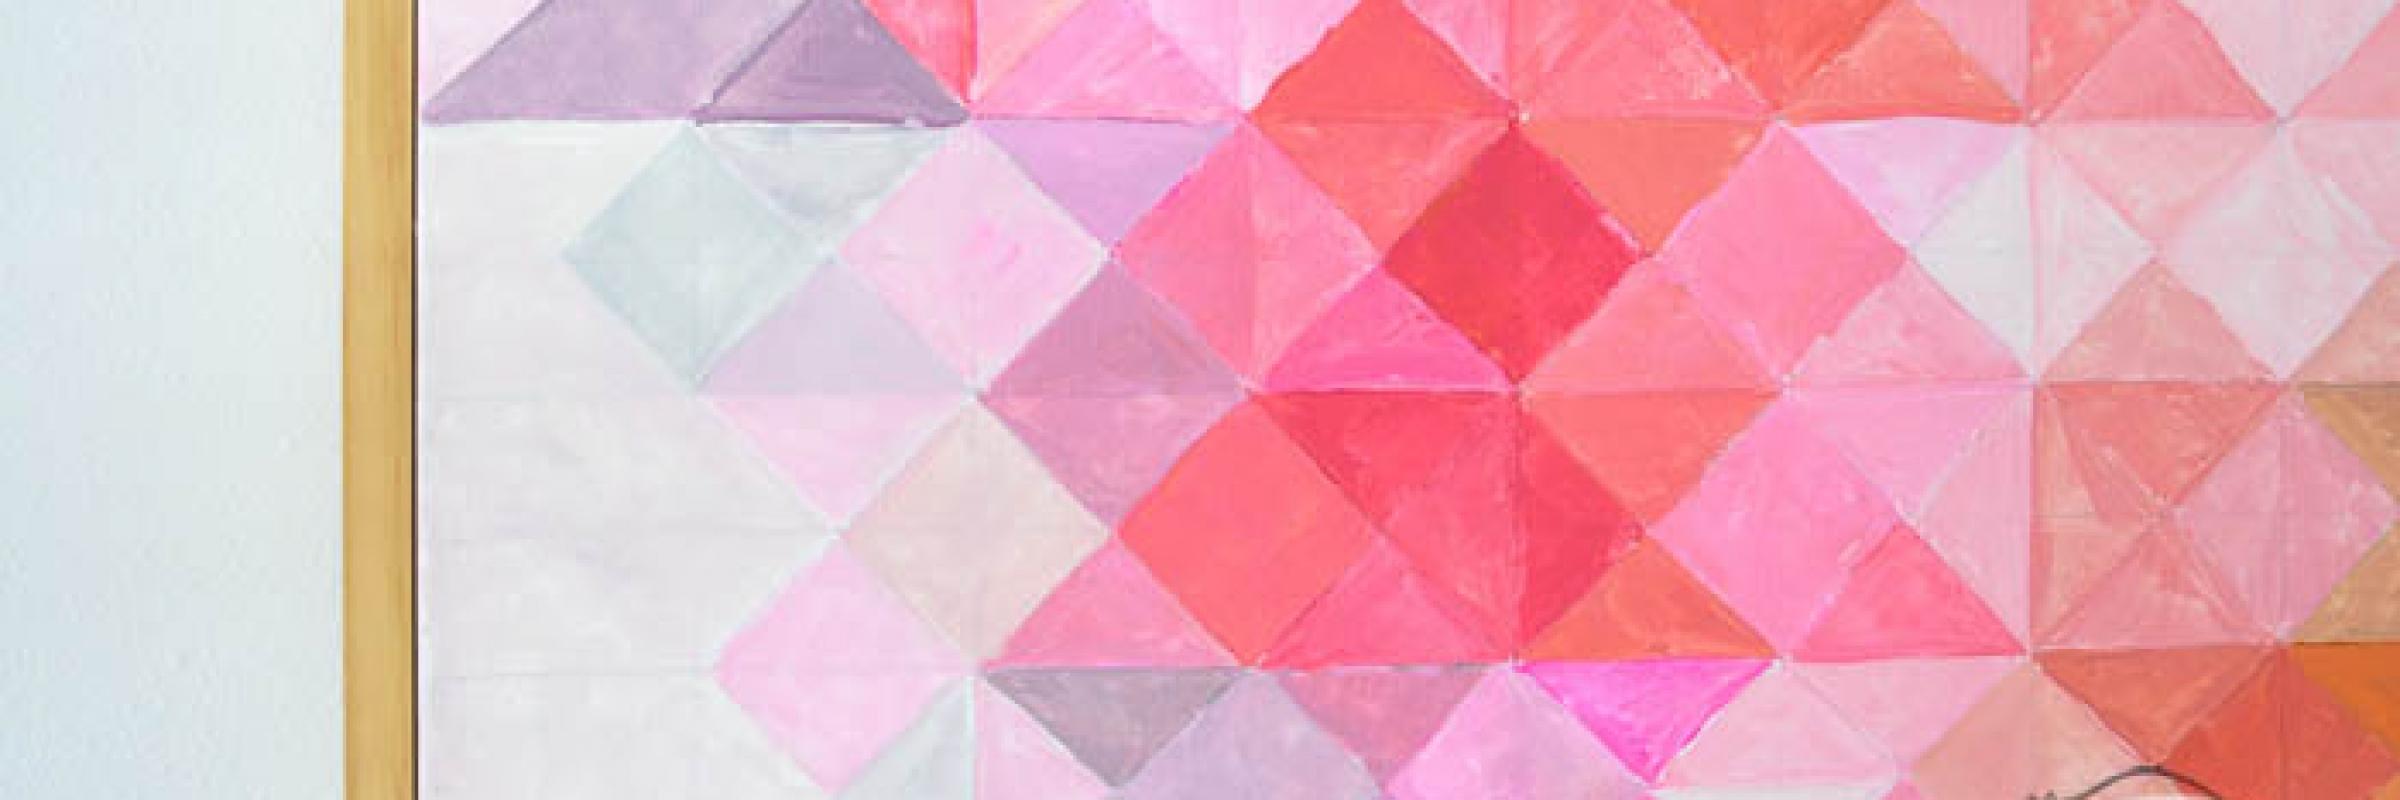 diy pixel art-44